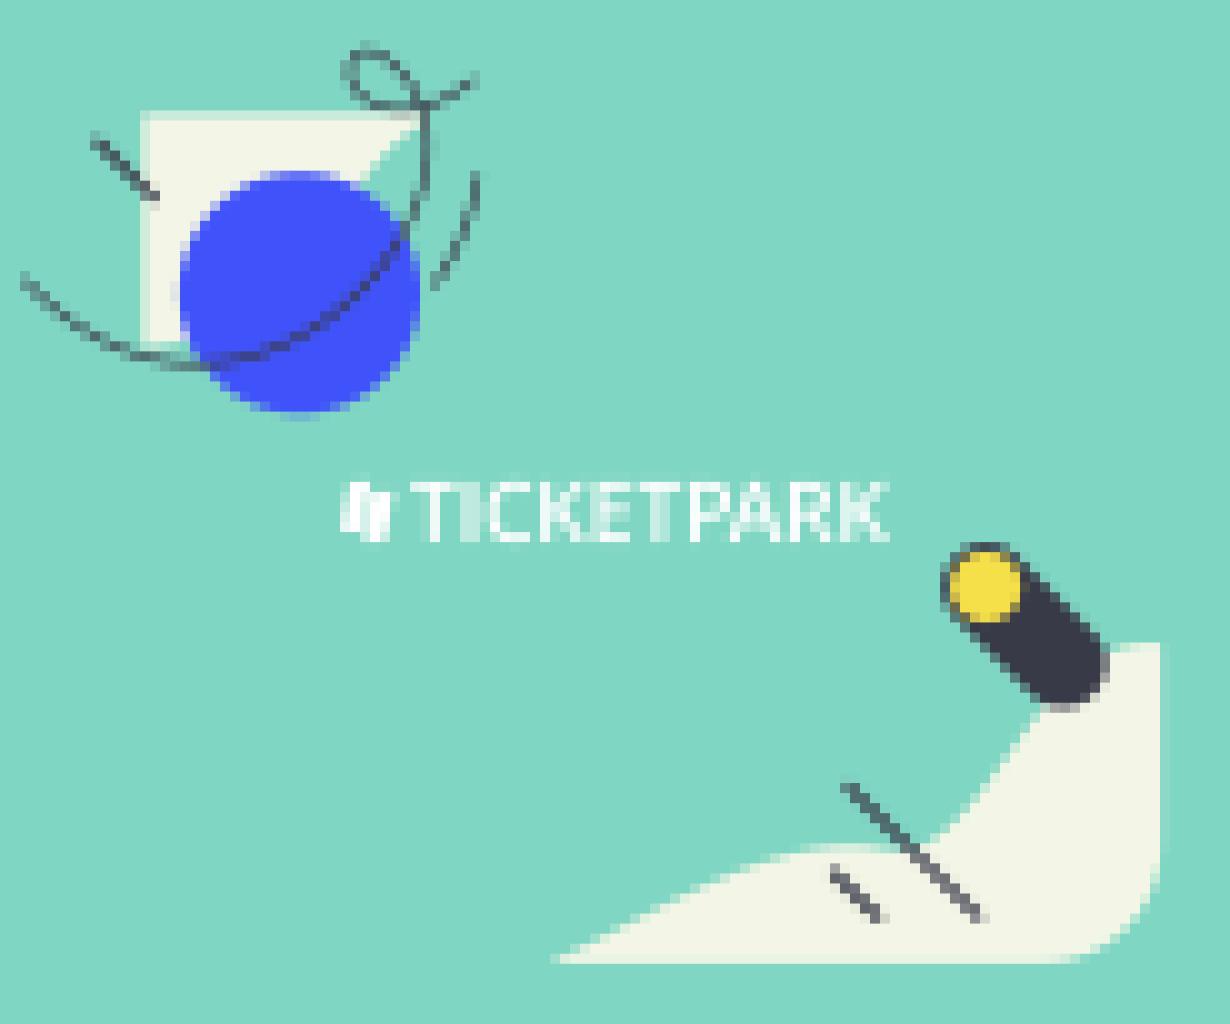 Ticketpark logo